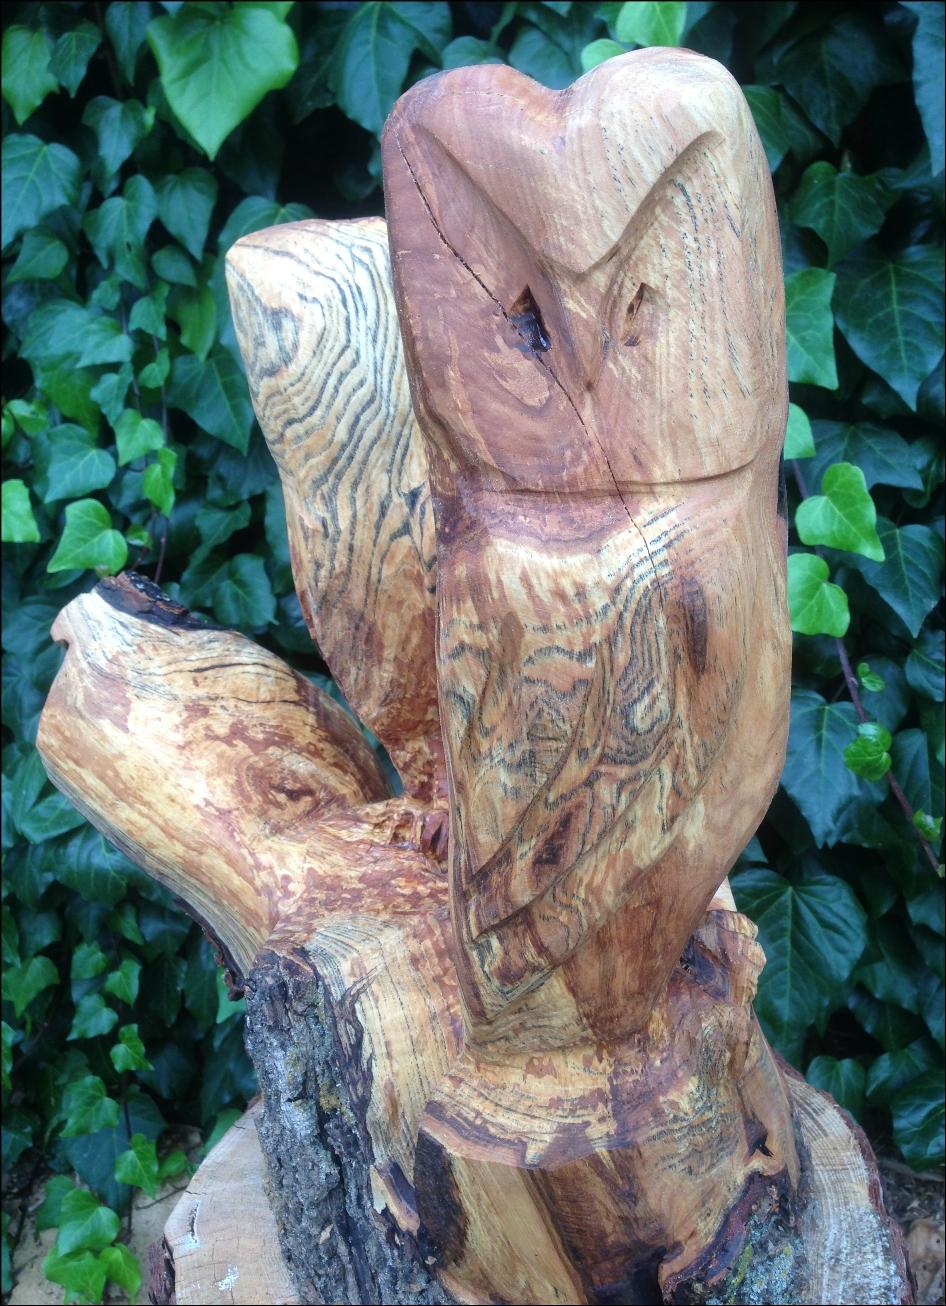 150 20130825 Owl Barn Pair (2).JPG